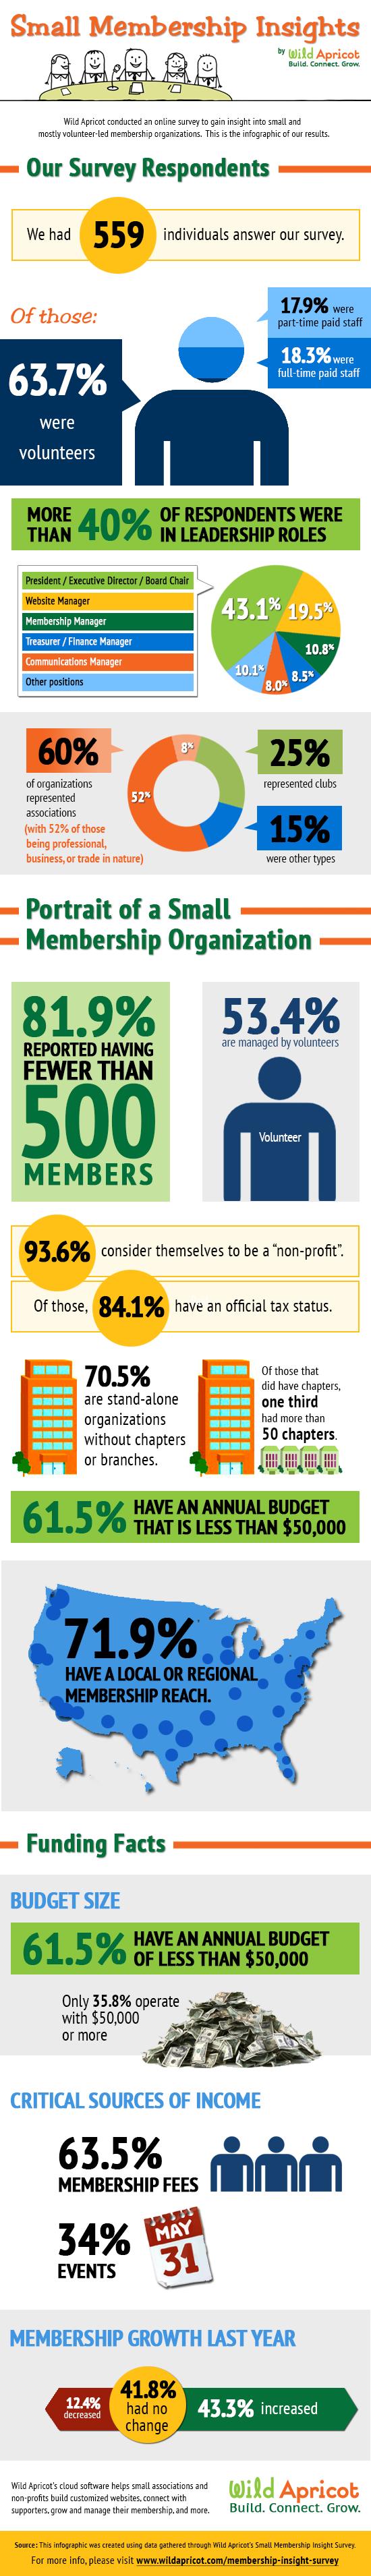 Small Membership Insights - Full Results